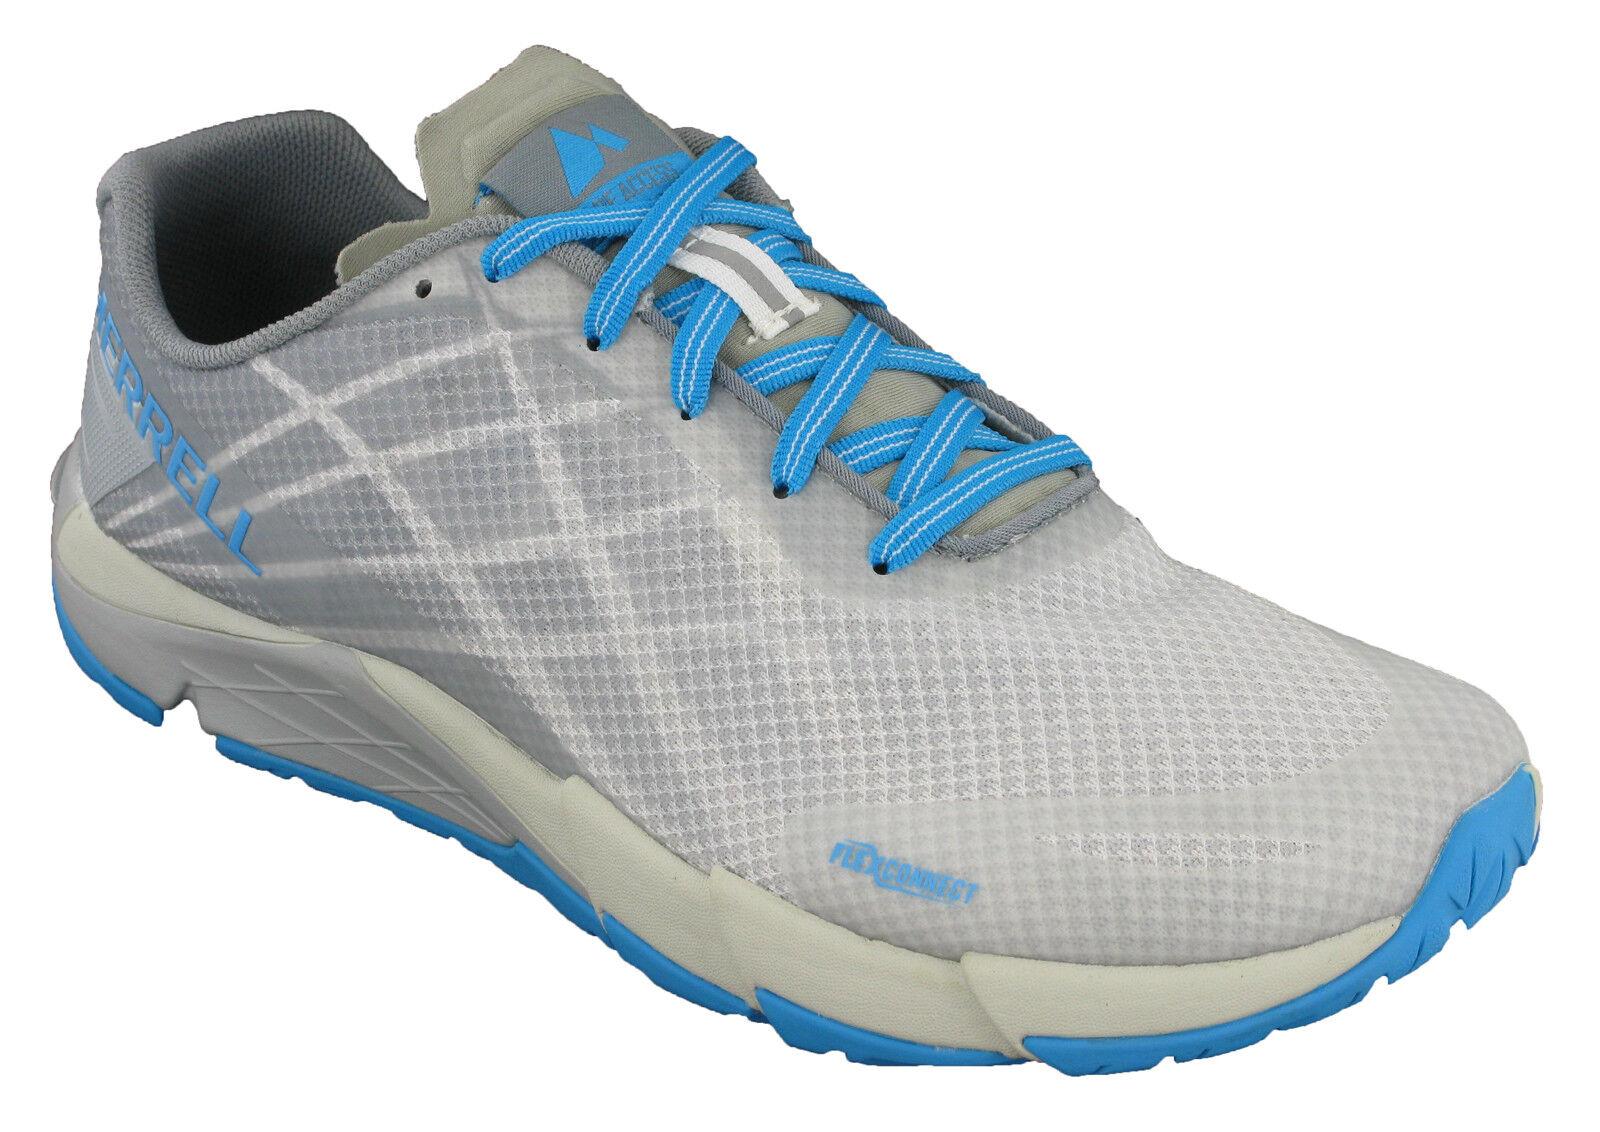 Merrell Bare Access Flex Ladies Running Trainer  Trail Hiking scarpe J09658  conveniente